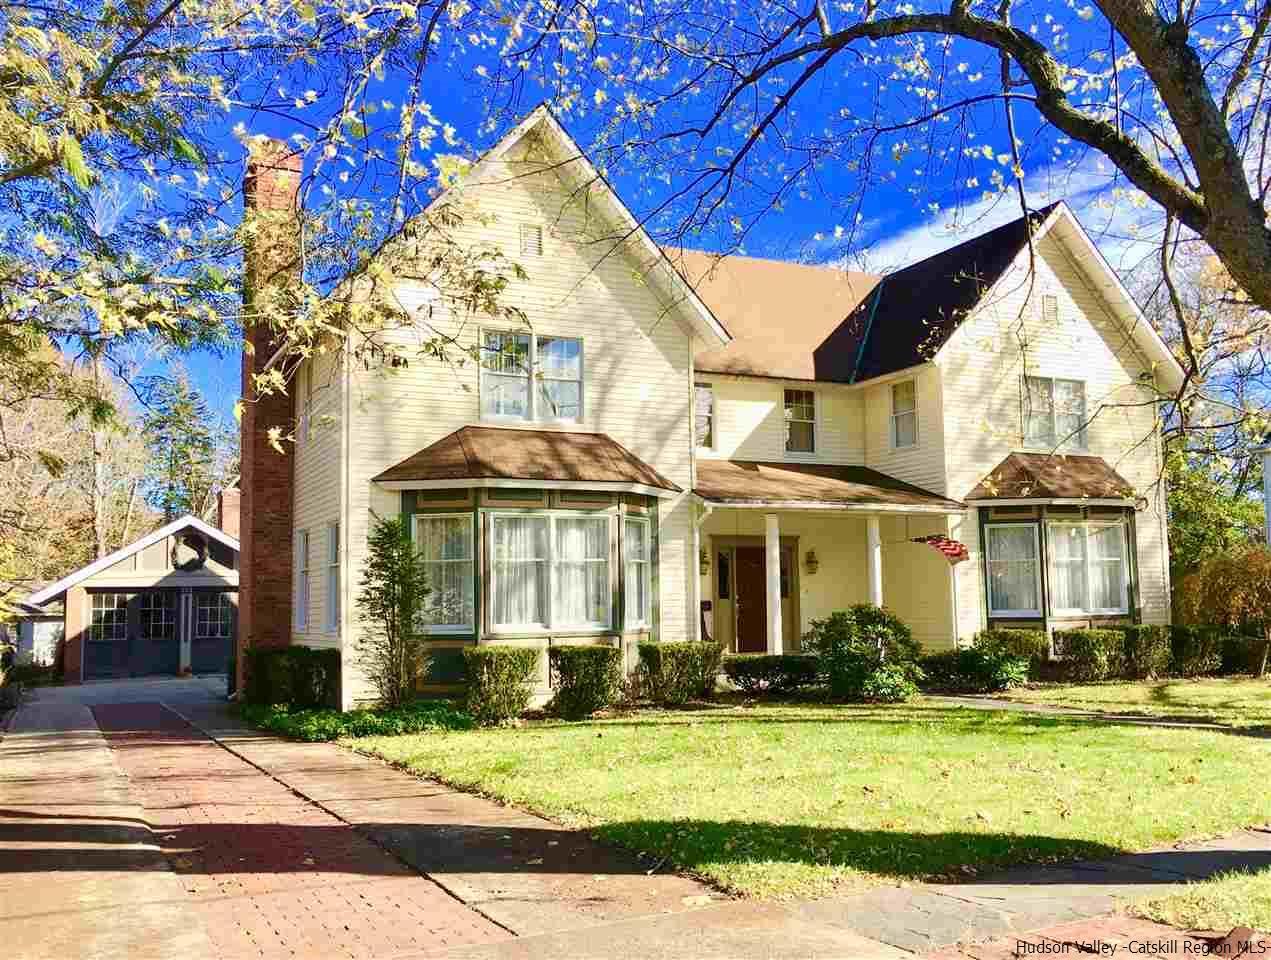 Single Family Home for Sale at 9 Cedar Street 9 Cedar Street Saugerties, New York 12477 United States